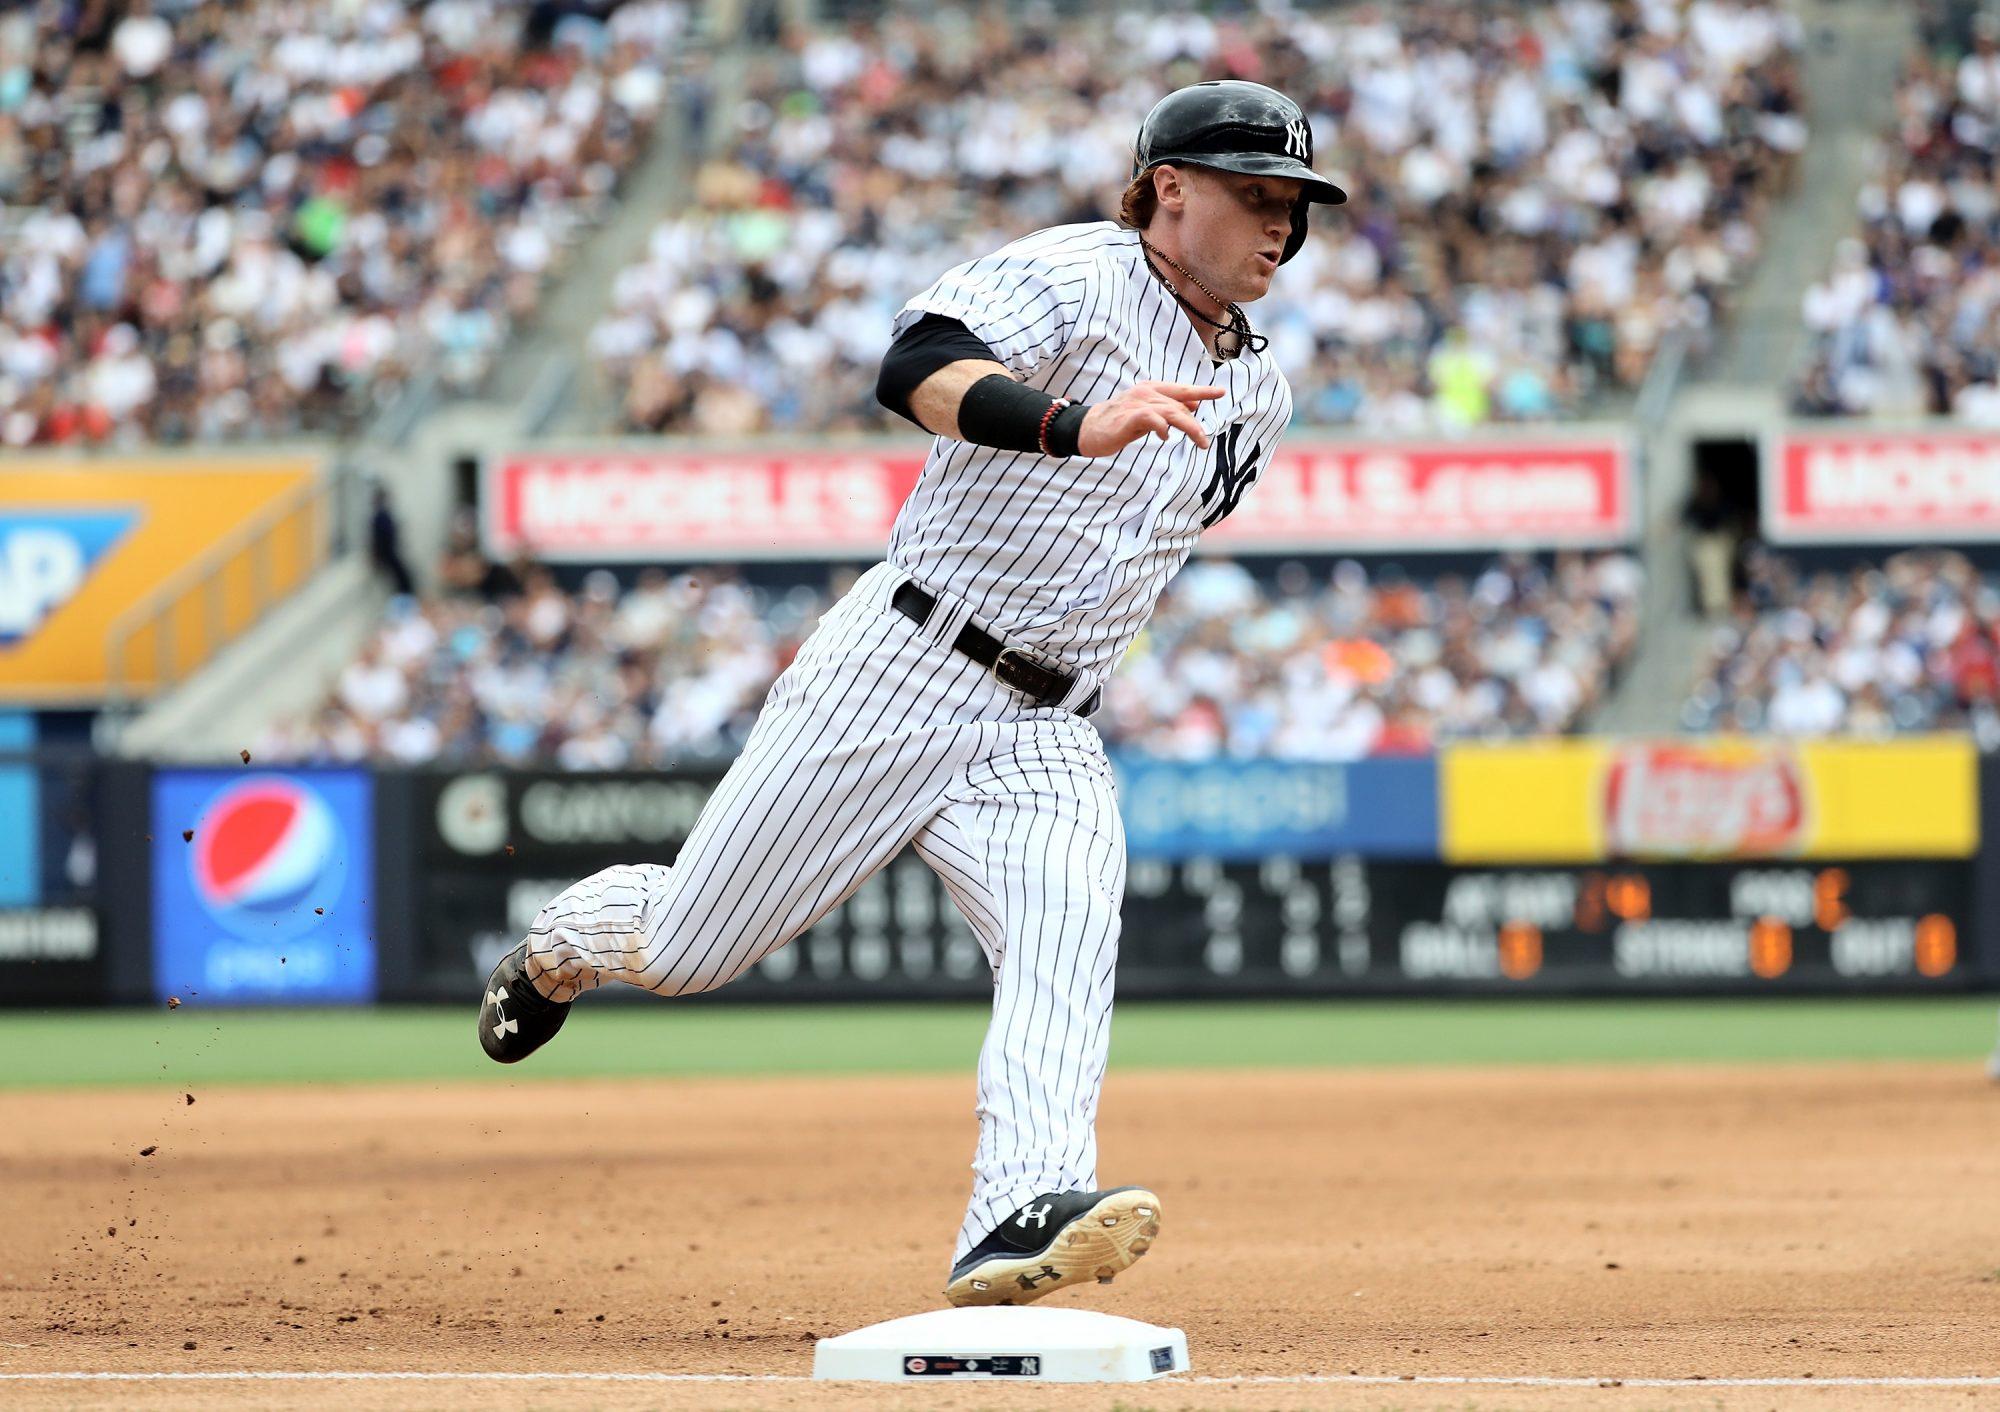 New York Yankees Bomber Buzz, 9/8/17: Red Thunder Looms on the Horizon